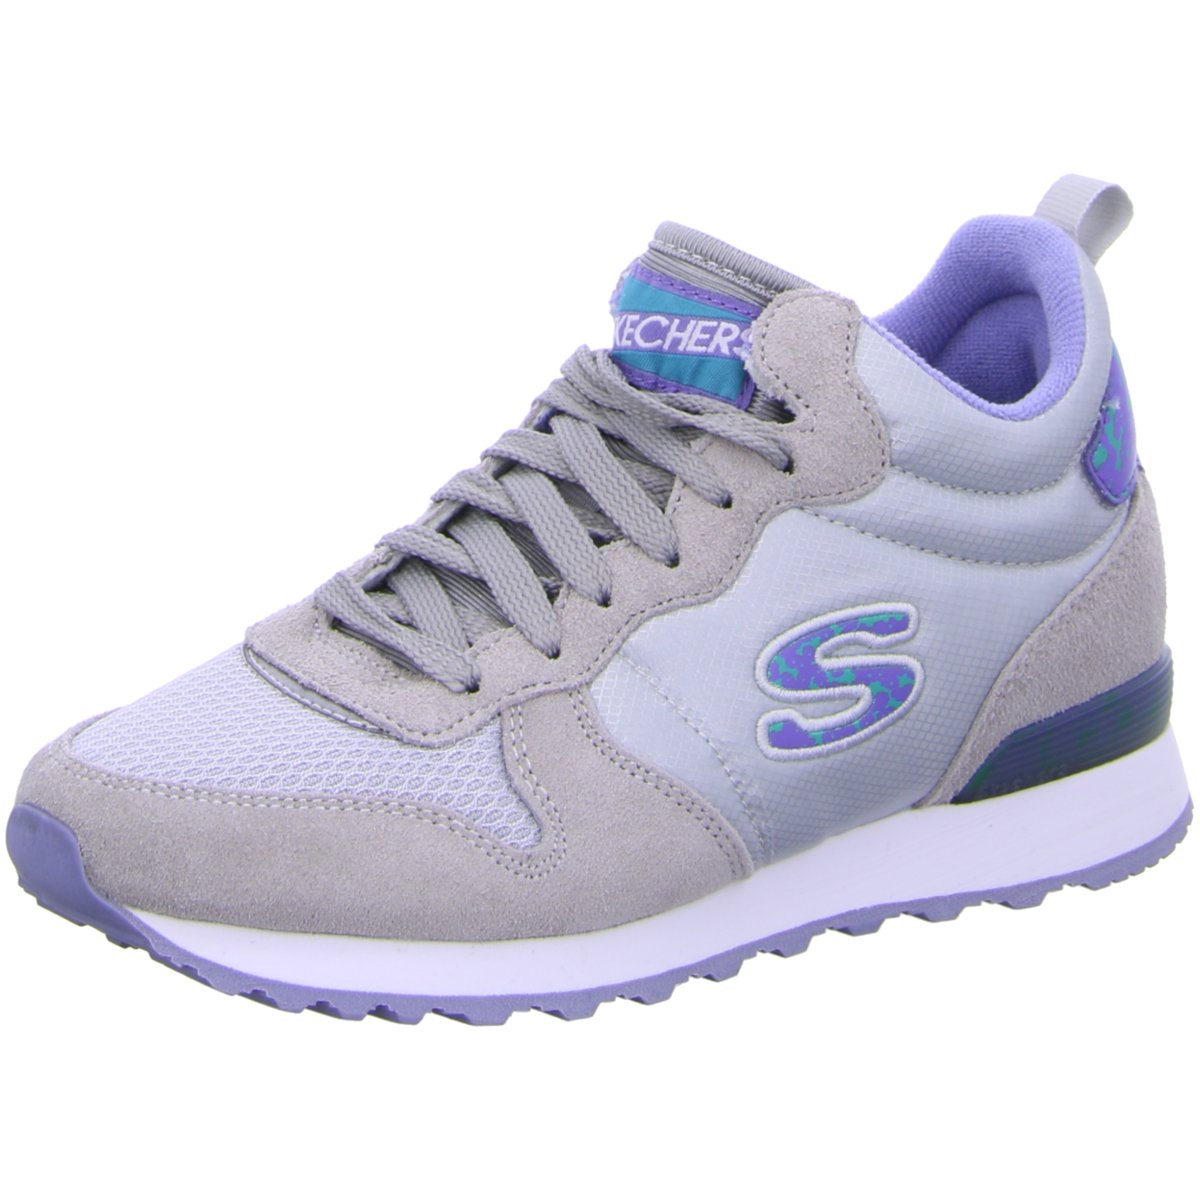 NEU Skechers Damen Sneaker Schnürstiefelette Schnürstiefelette Sneaker Kaltfutter sportlicher Boden OG 716a22